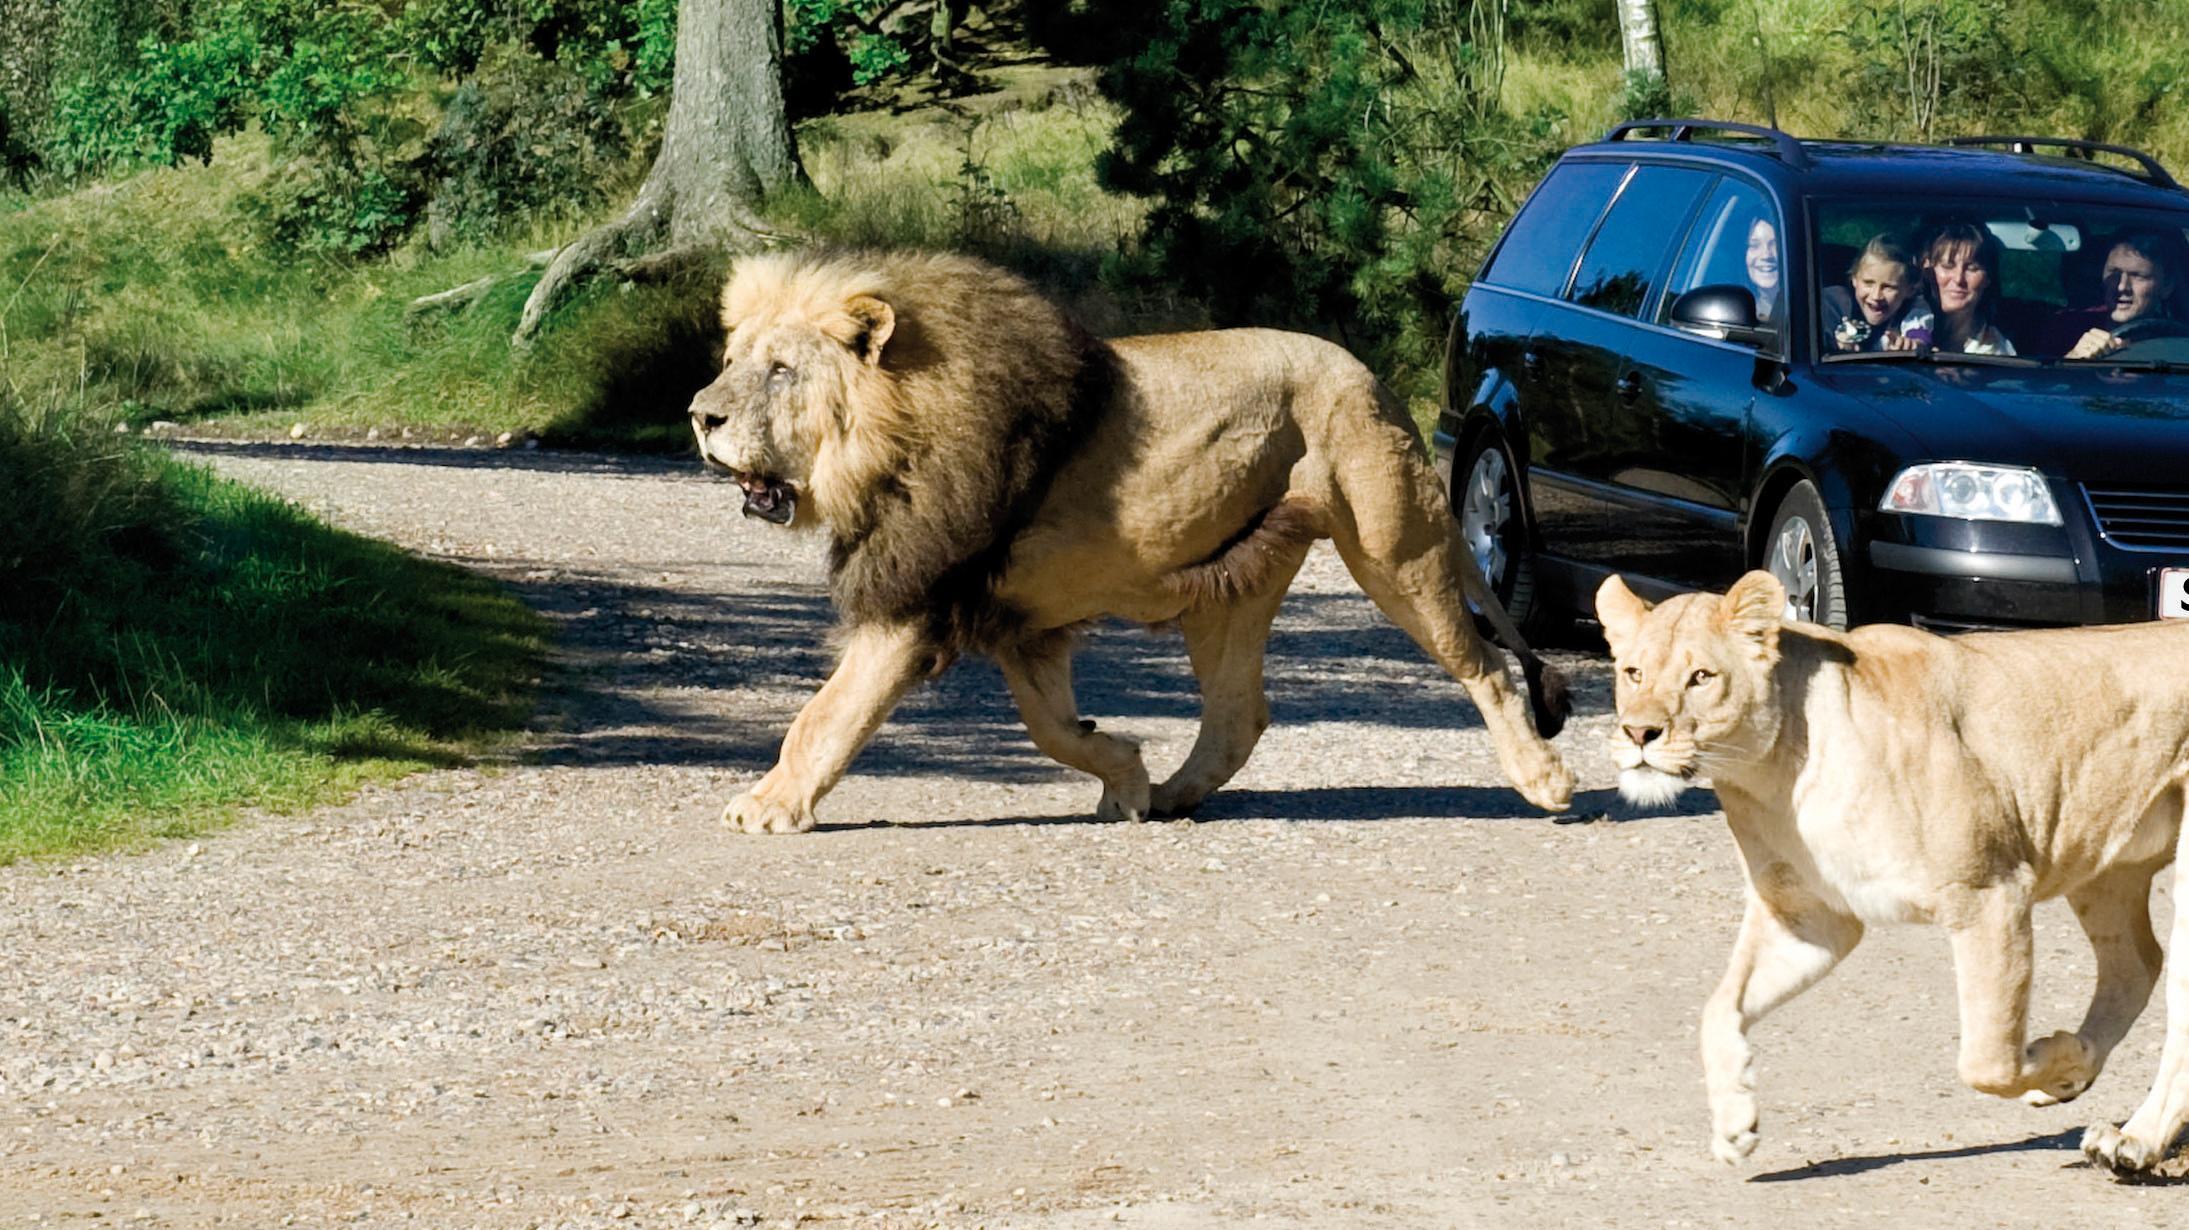 givskudzoo_safari_car_lions_a_rgb.jpg